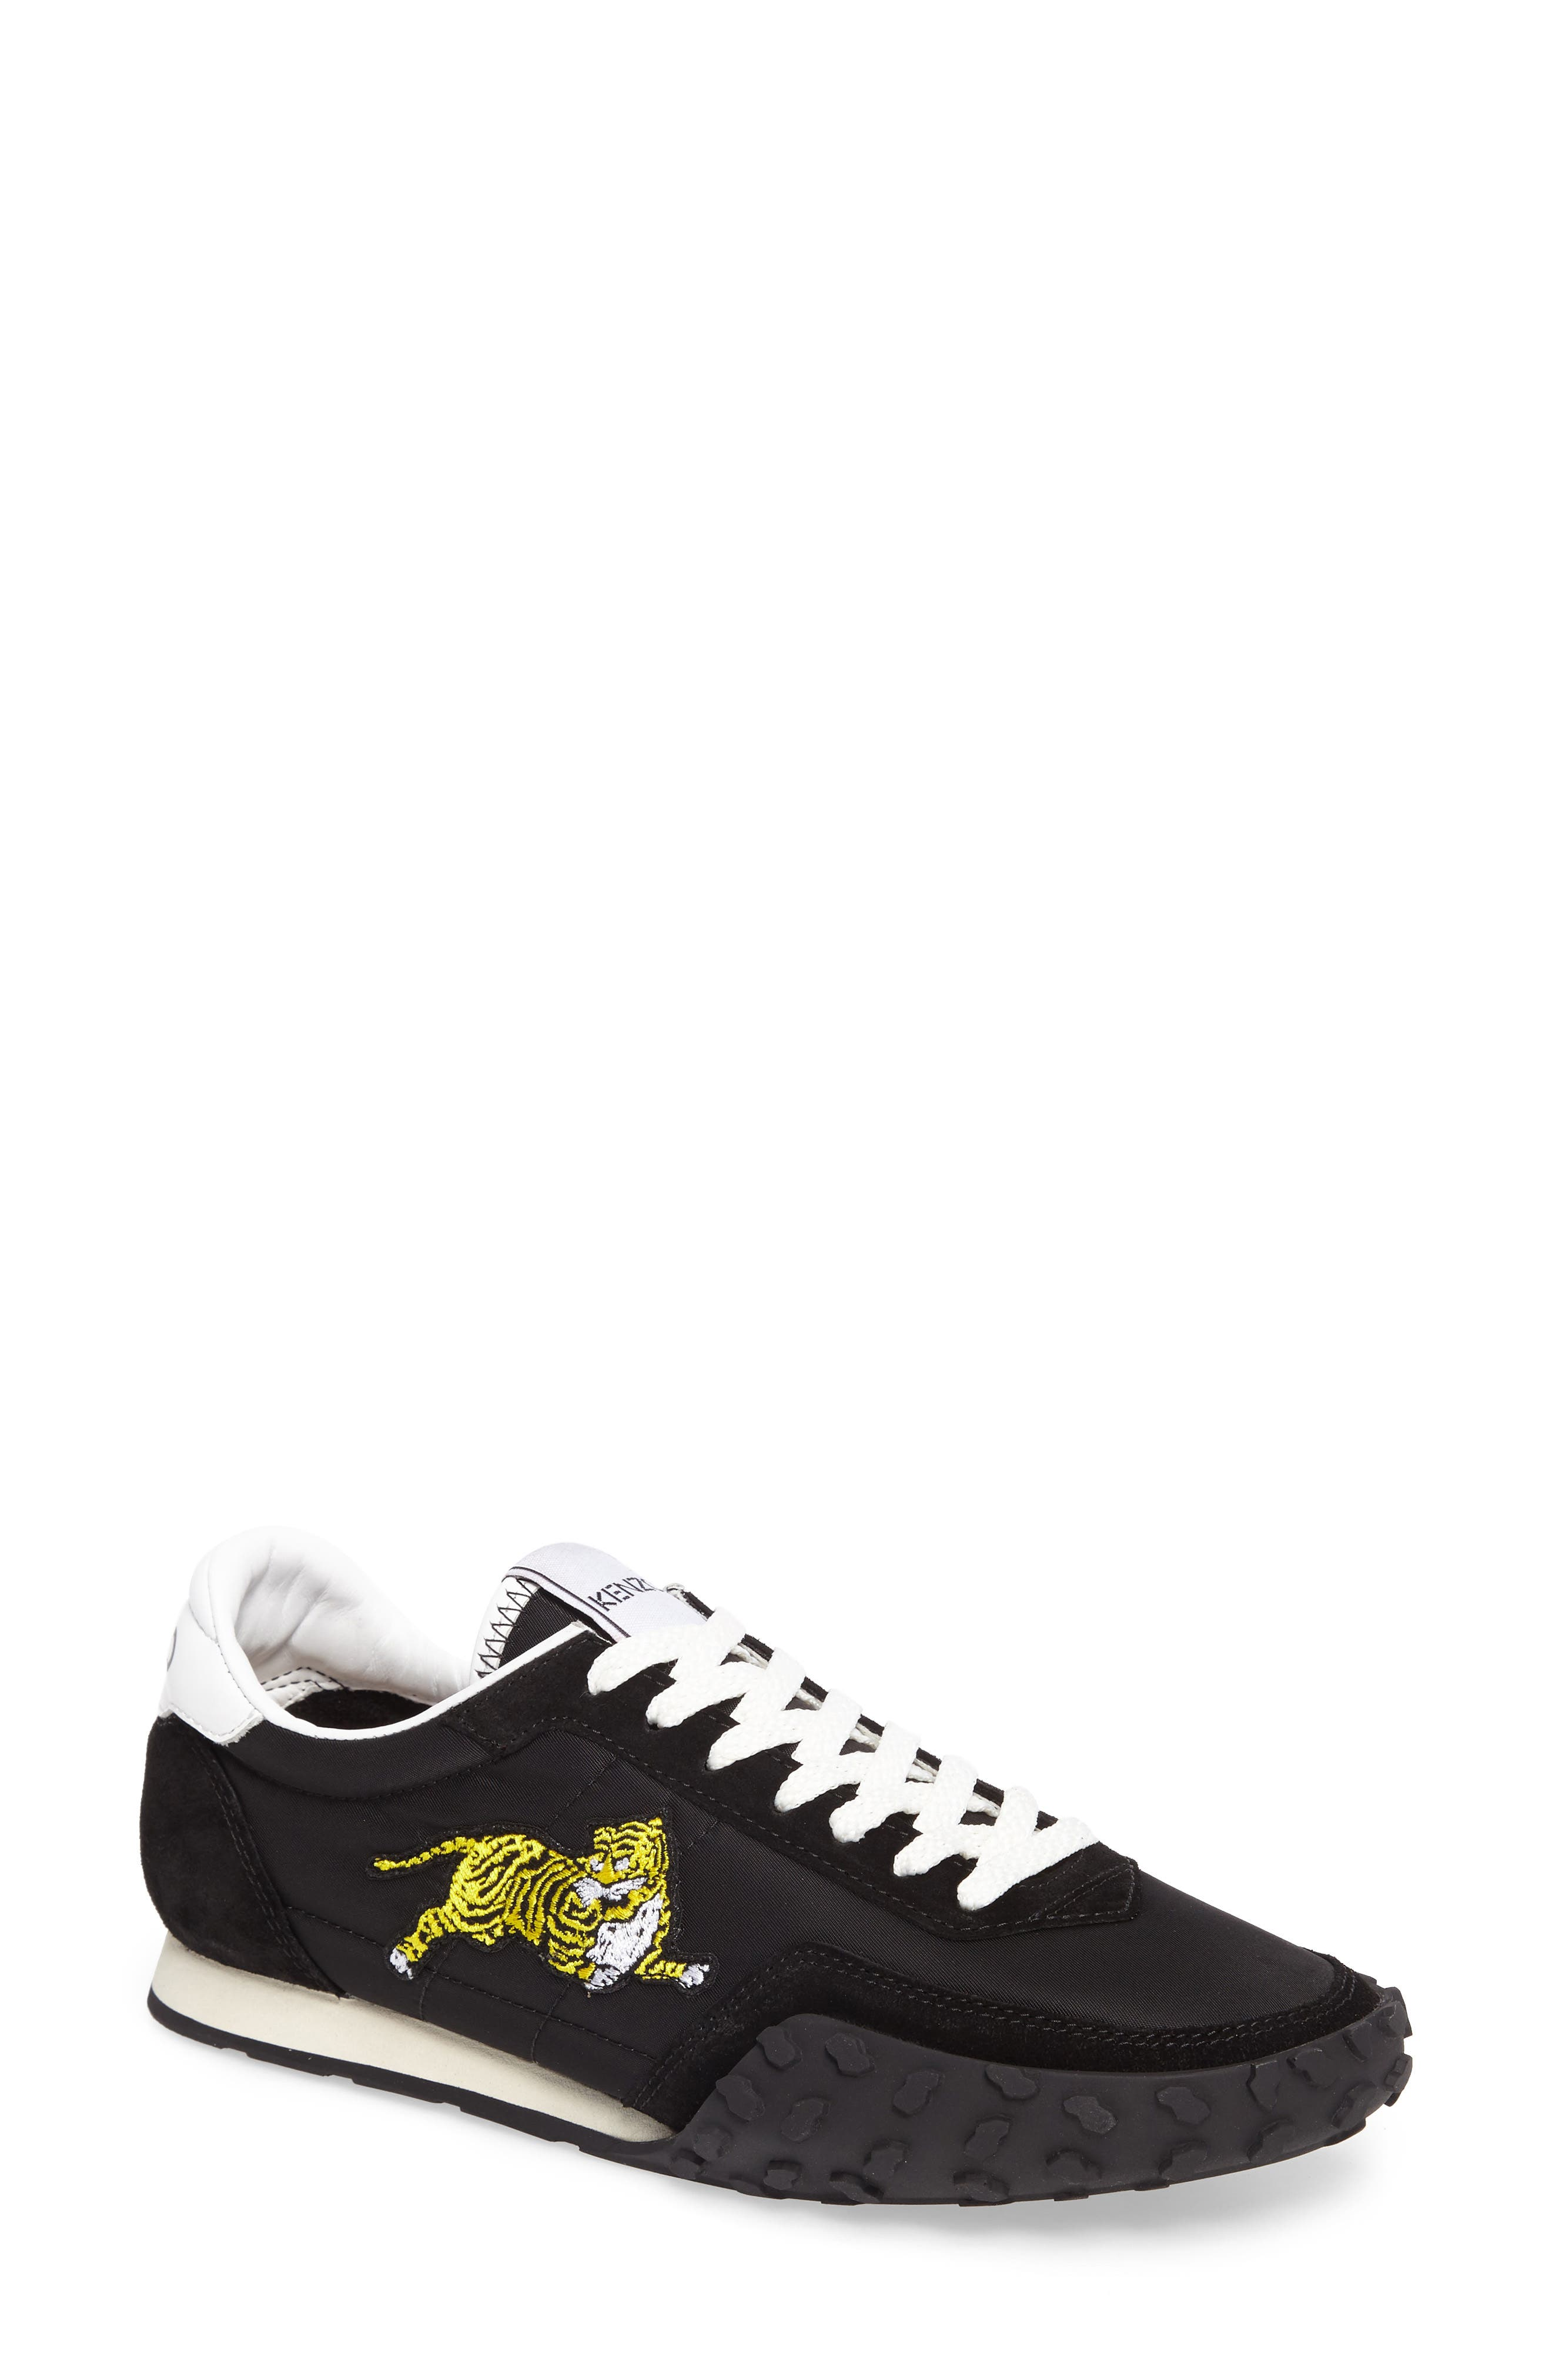 MOVE Sneaker,                             Main thumbnail 1, color,                             BLACK